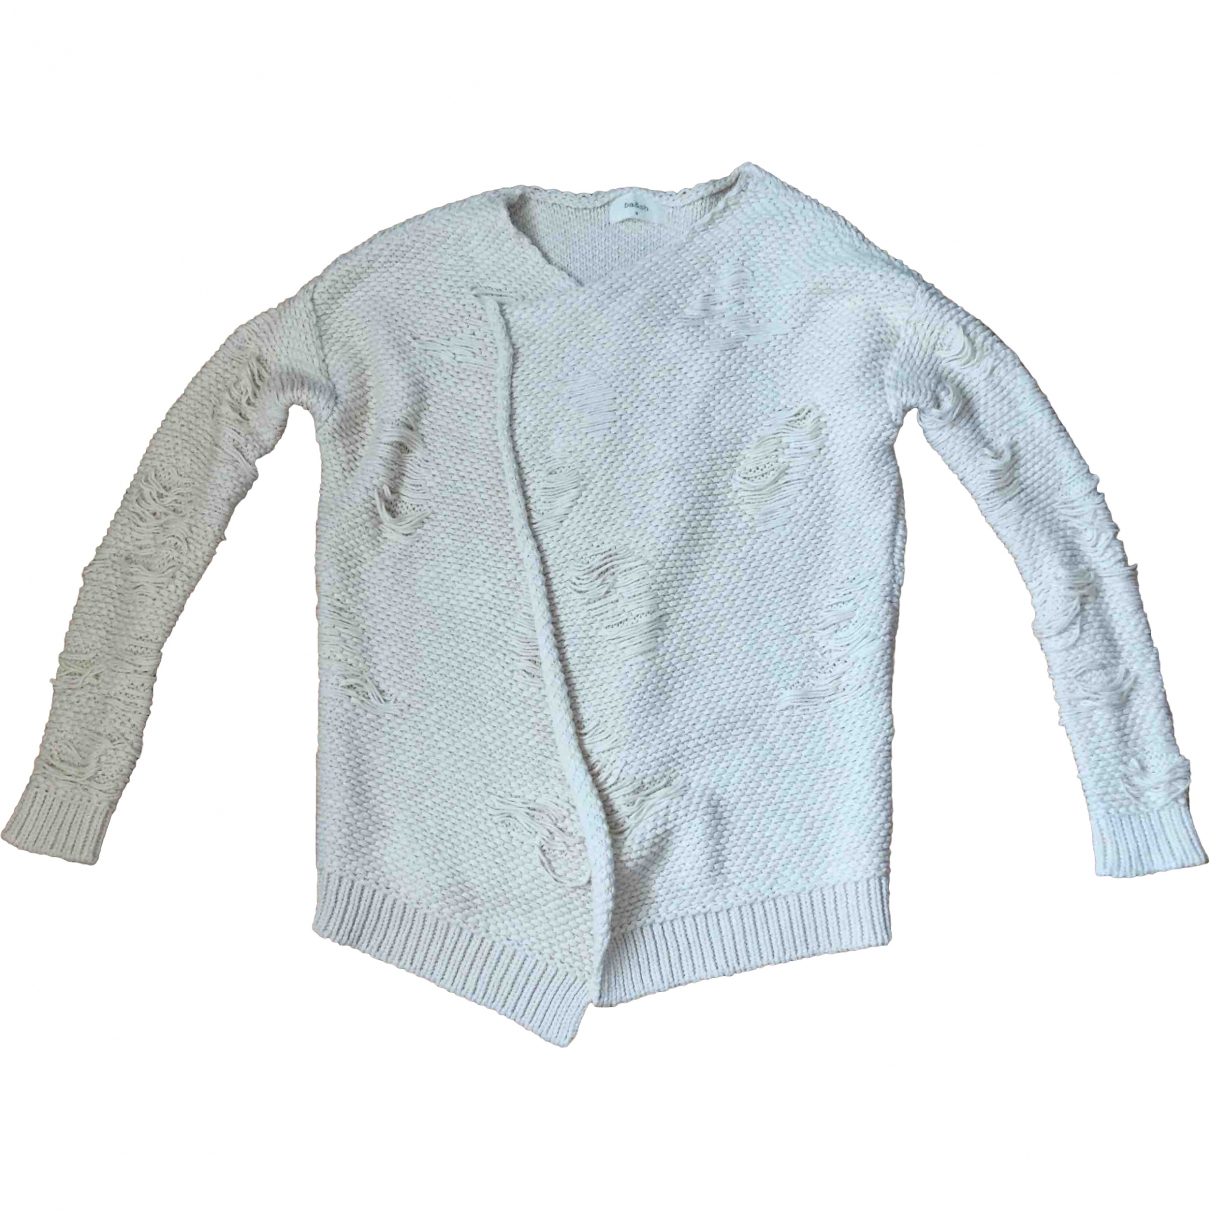 Ba&sh \N Pullover in  Ecru Baumwolle